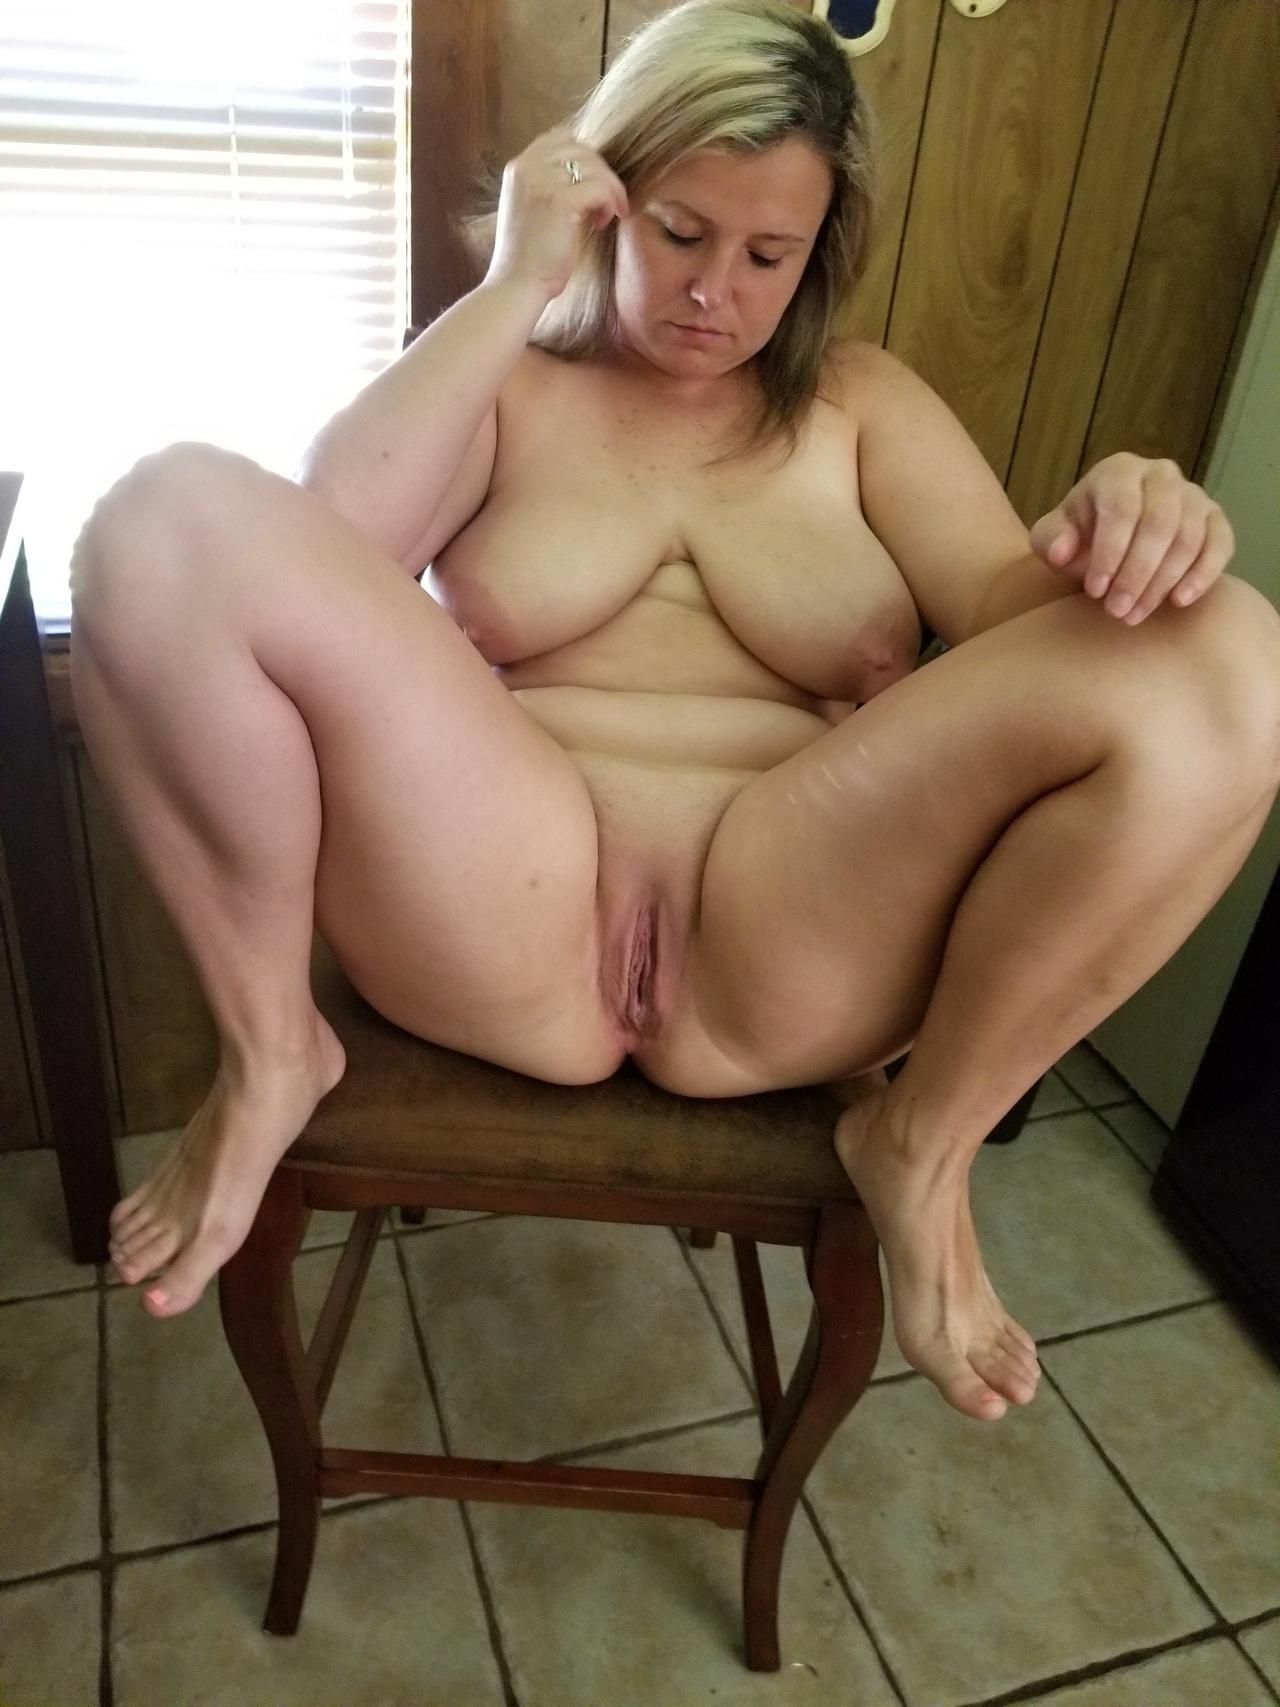 Frohlich schwanz porno